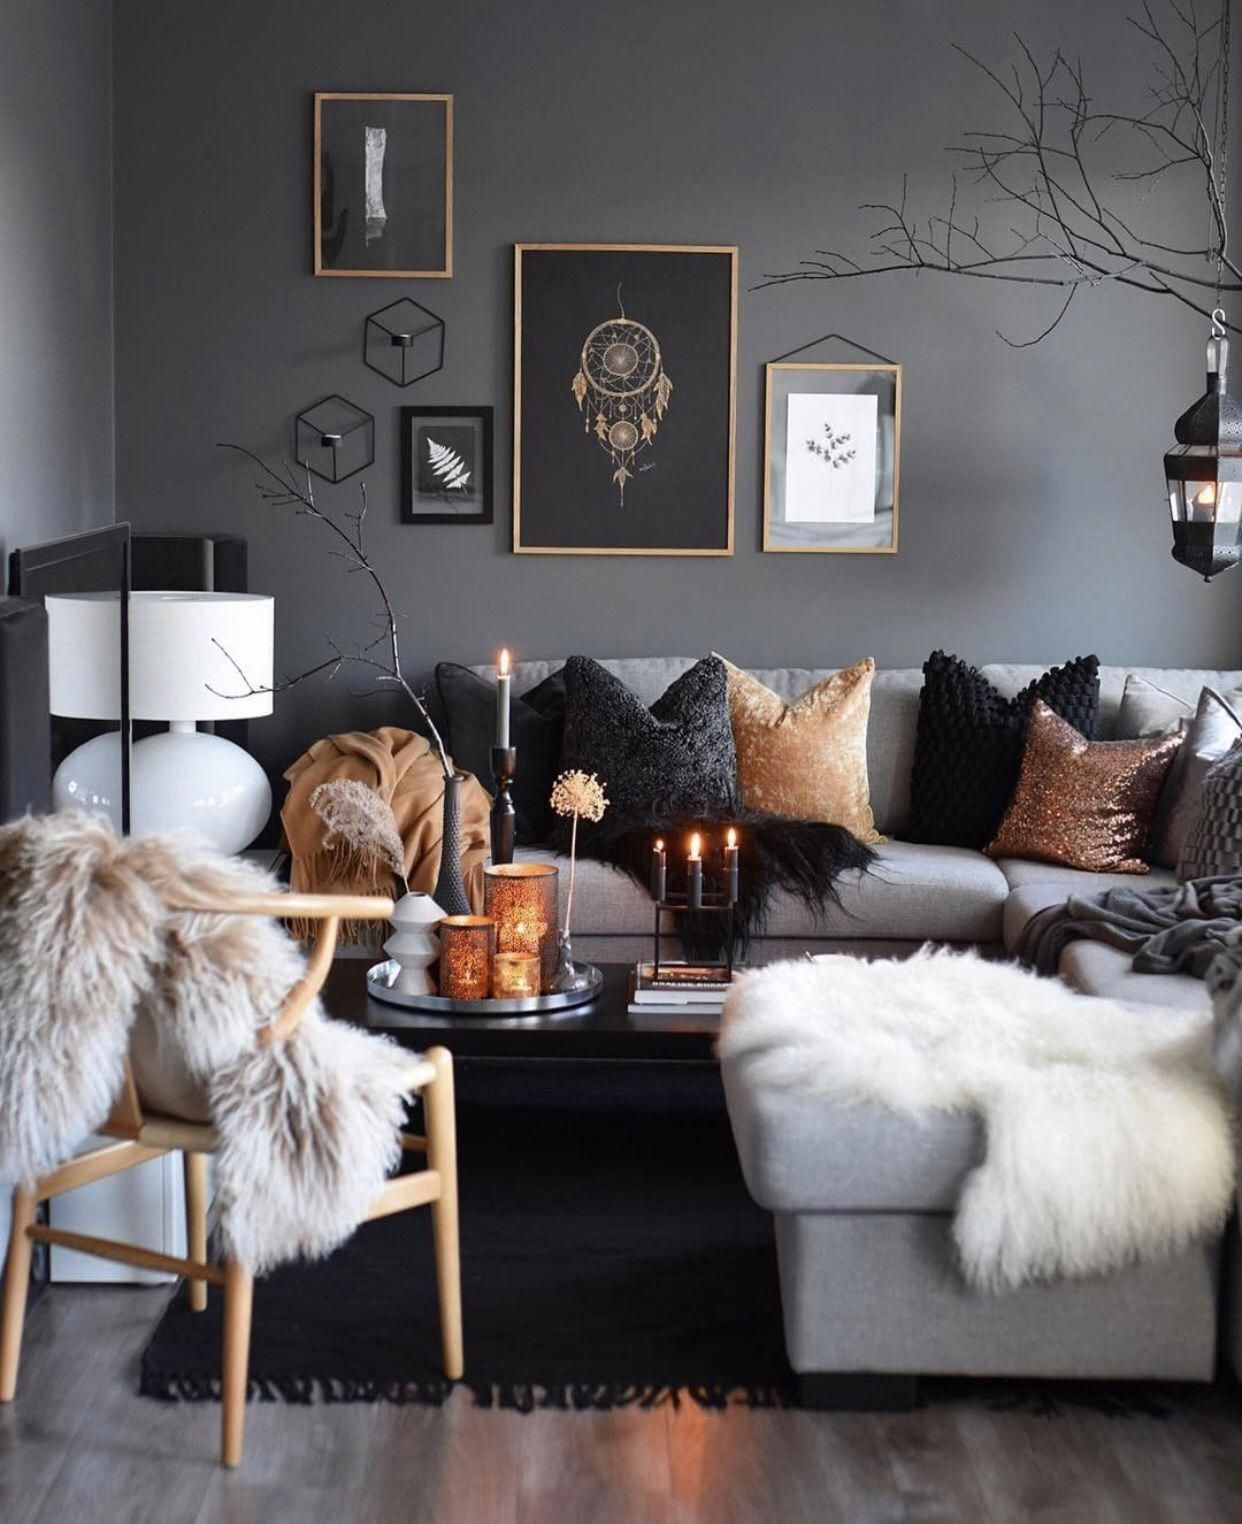 home decoration cheap ideas luxuryinteriordesign luxury interior rh pinterest com